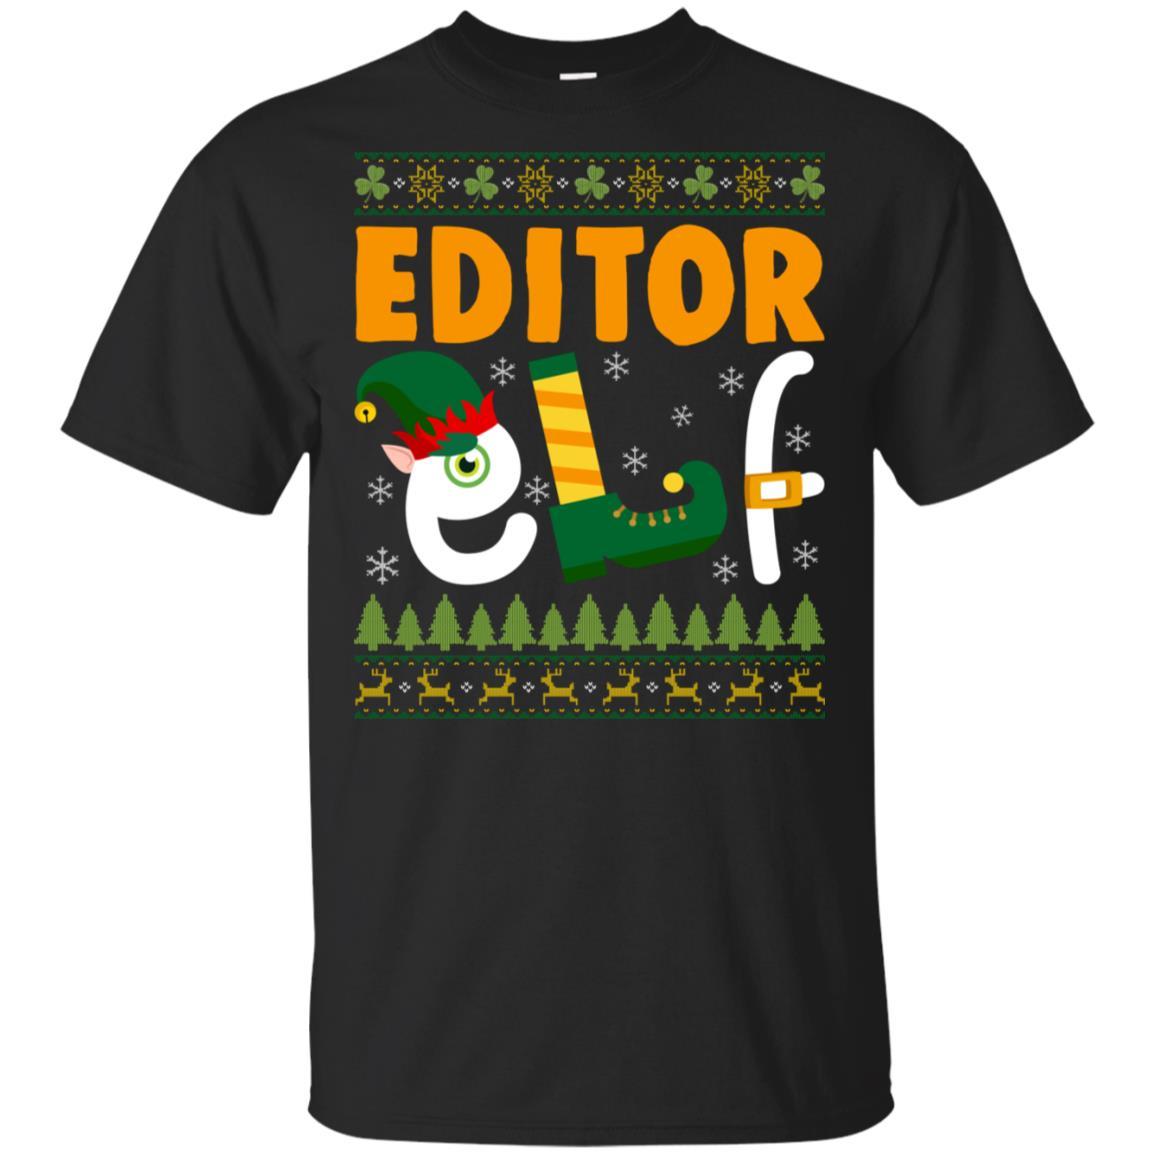 Editor Elf Unisex Short Sleeve